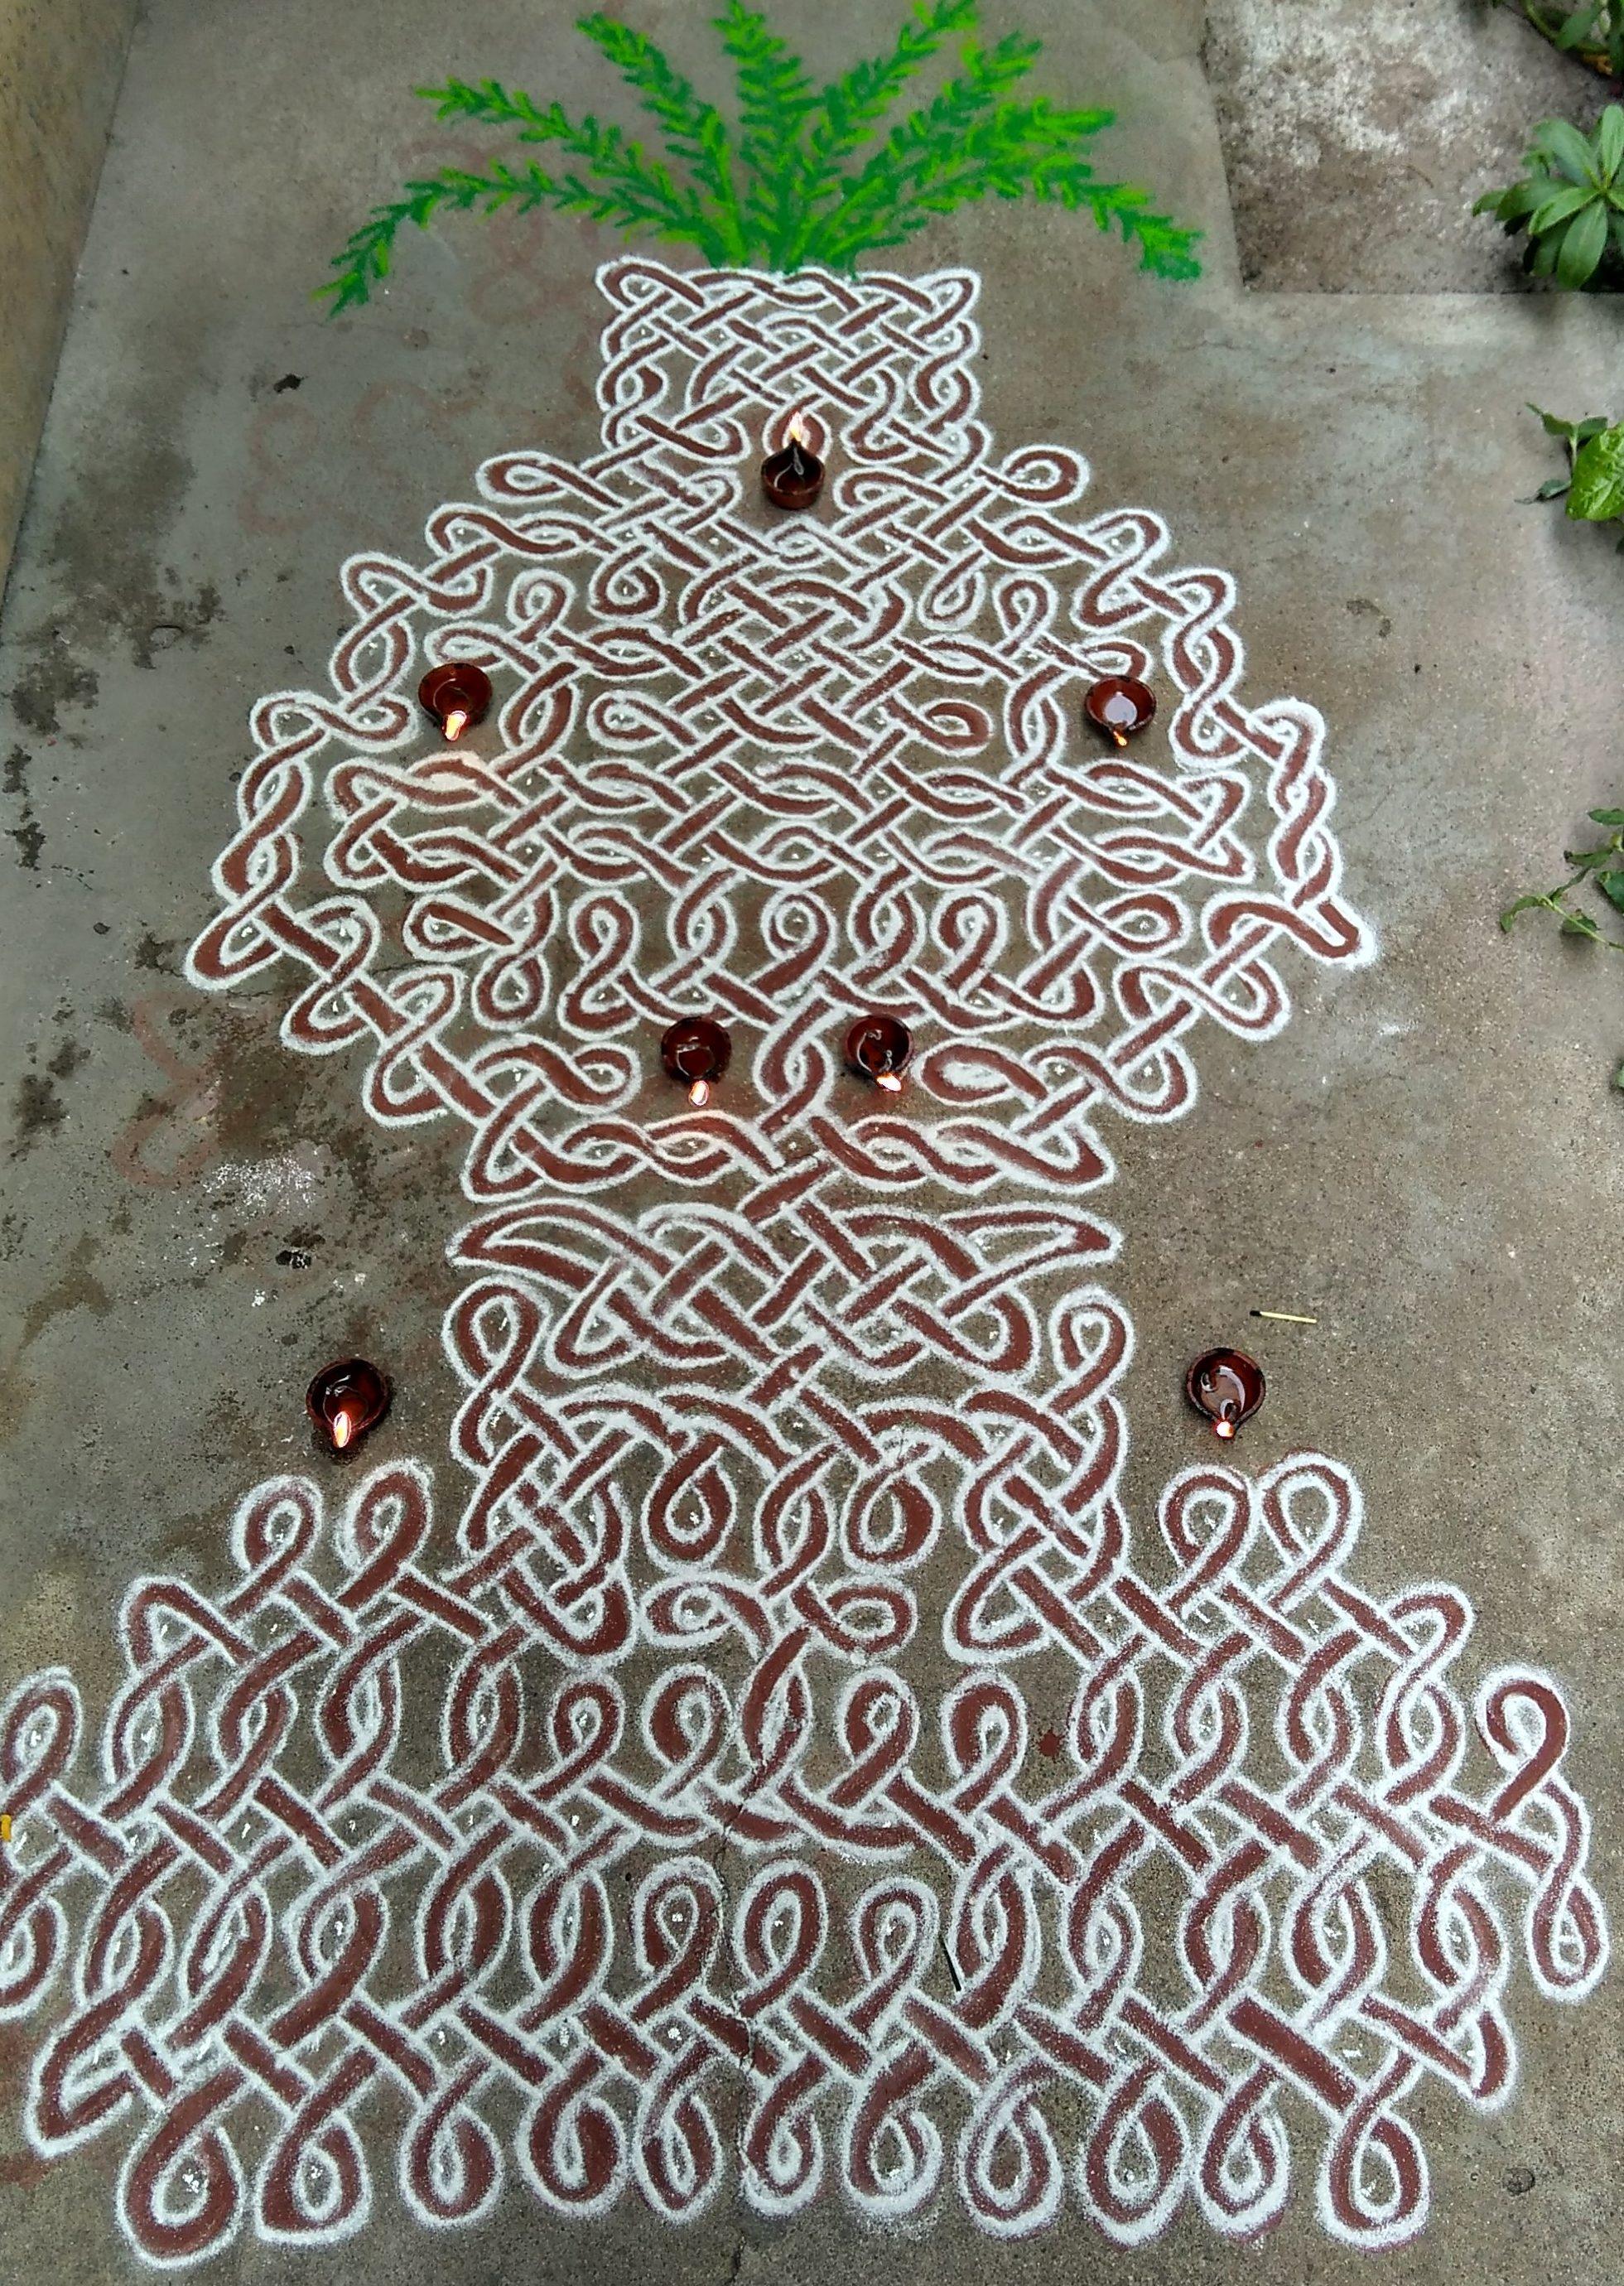 sikku kolam 25 dots contest kolam || Tulasi Brindhavan Kolam